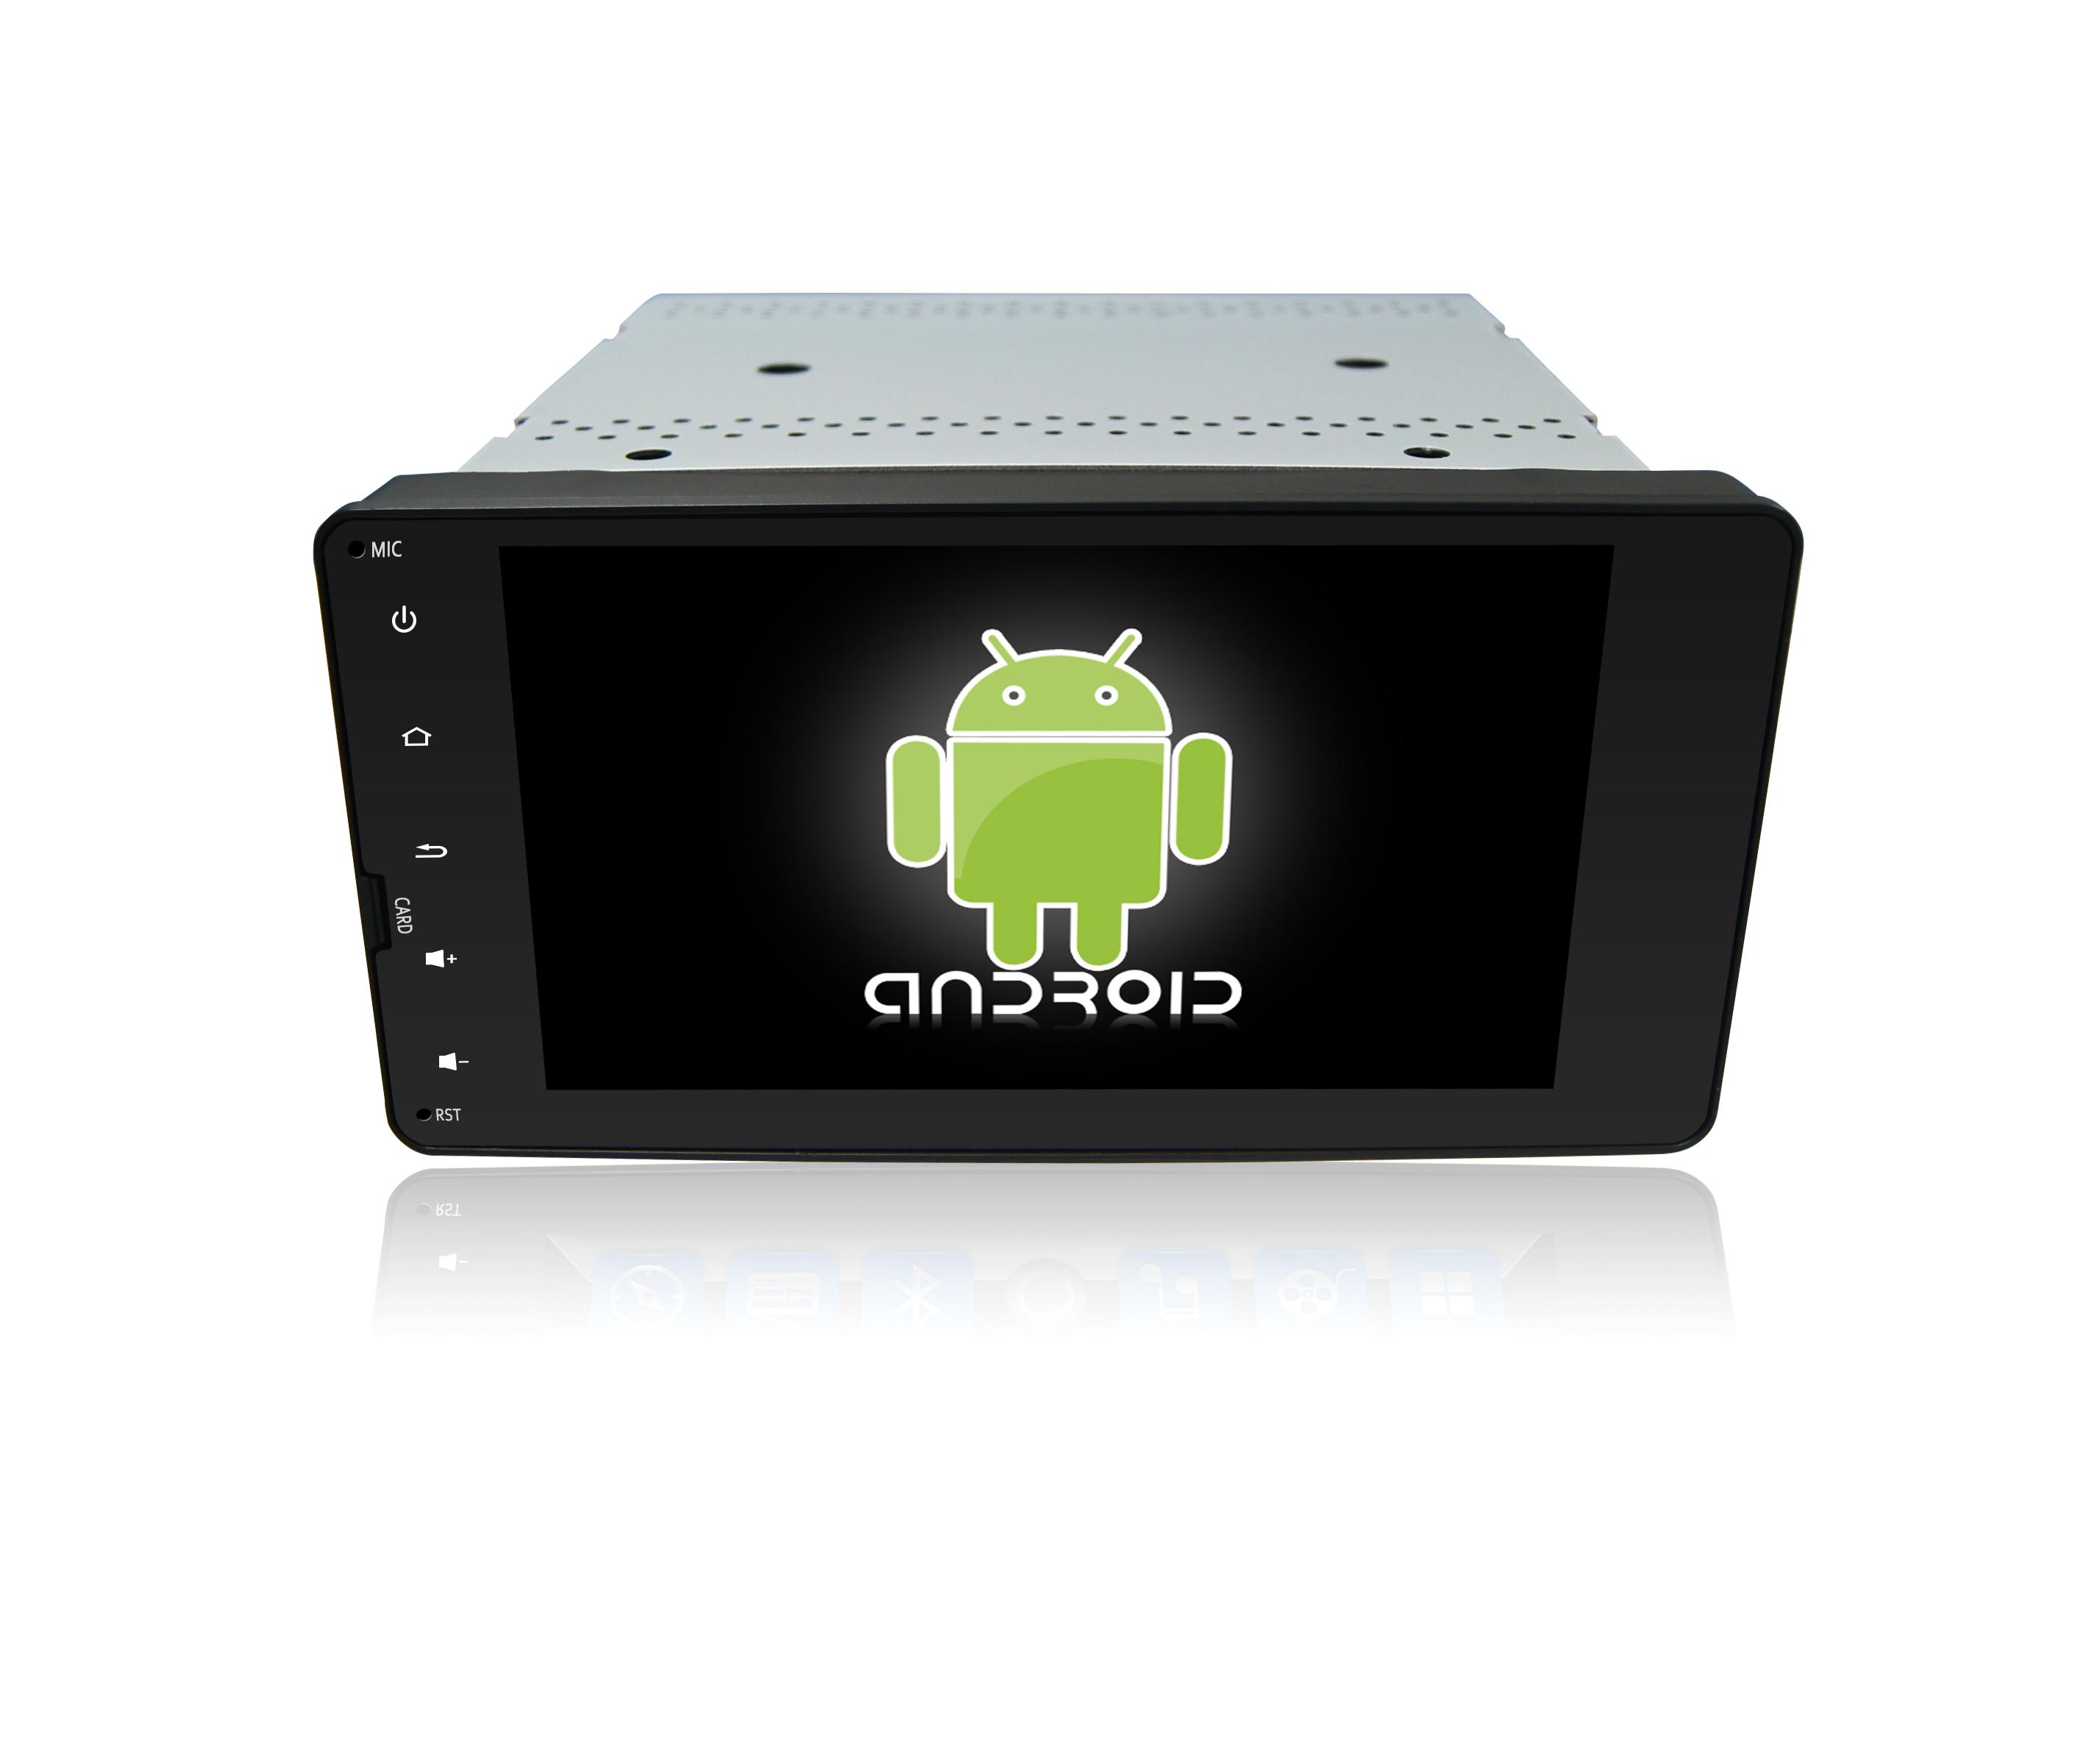 Штатная магнитола CARMEDIA KR-7118-T8 для Mitsubishi (Universal) Android 7.1.2 sailfish os sertificirovana v rossii v kachestve alternativy android